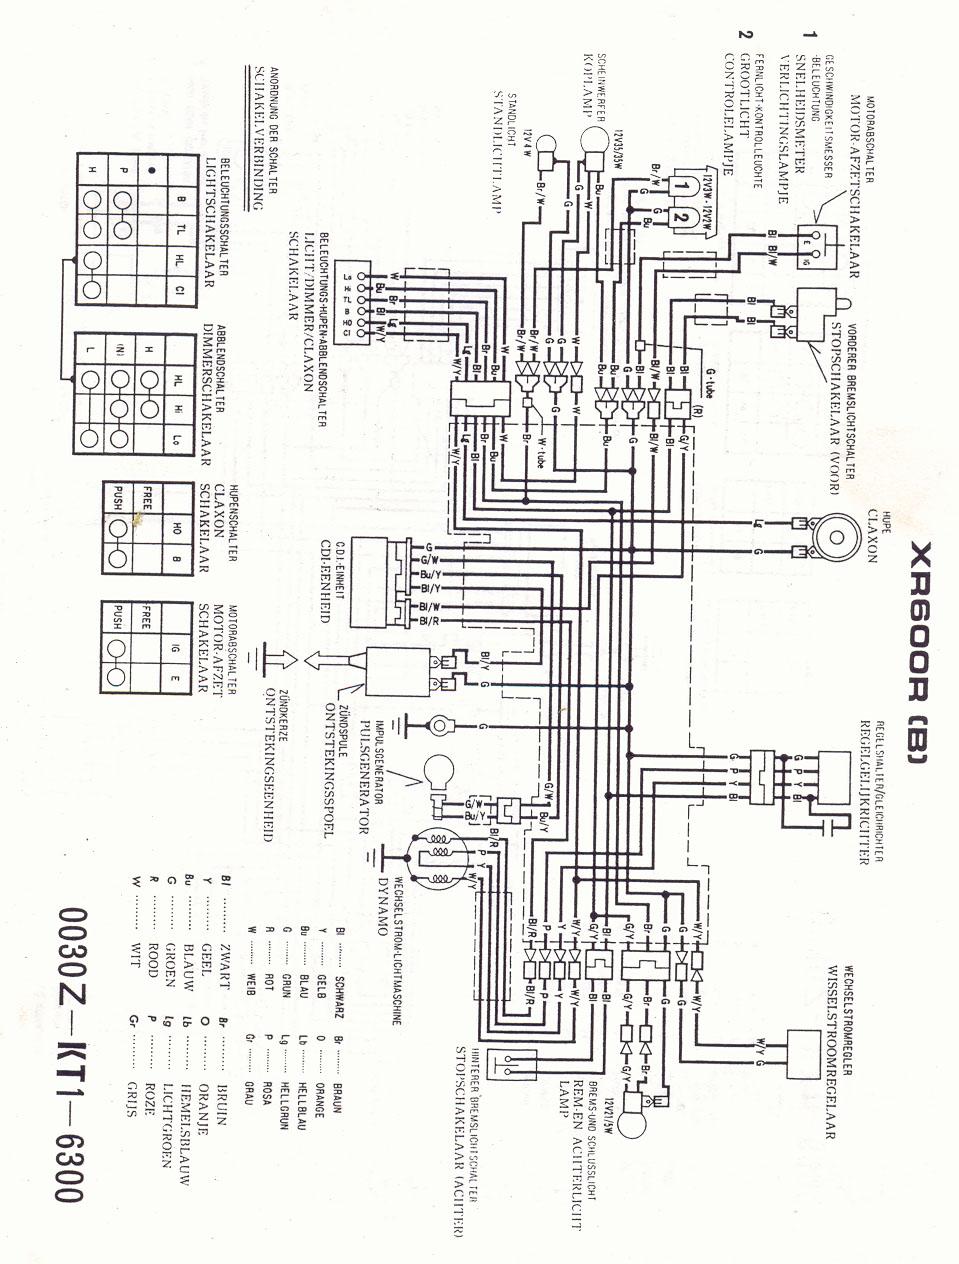 1984 Trx 200 Cdi Wiring Diagram